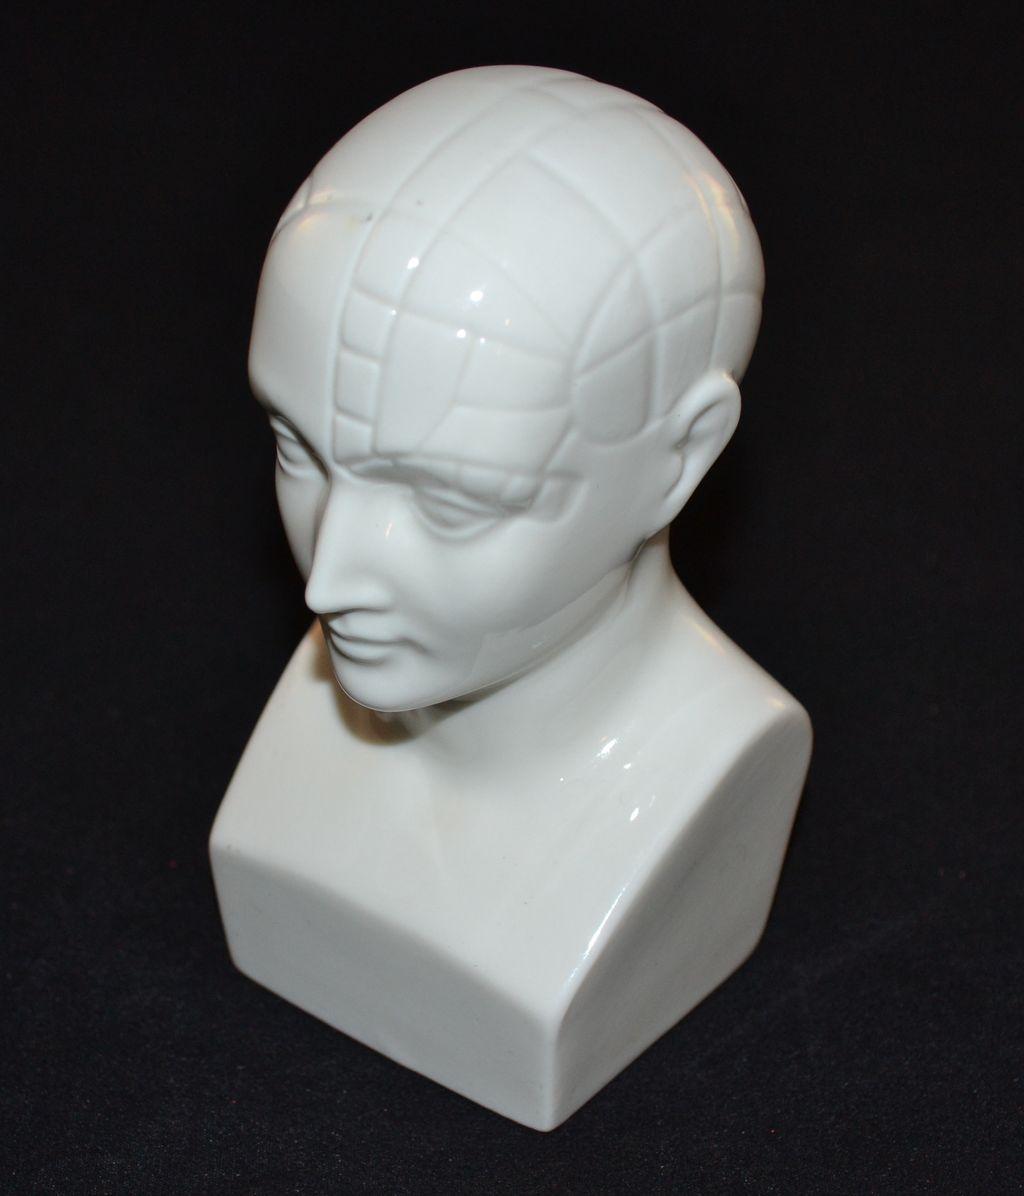 1950s Boehm ~ Antipsychotic Etrafon Porcelain Phrenology Head from blackwidowvintiques on Ruby Lane